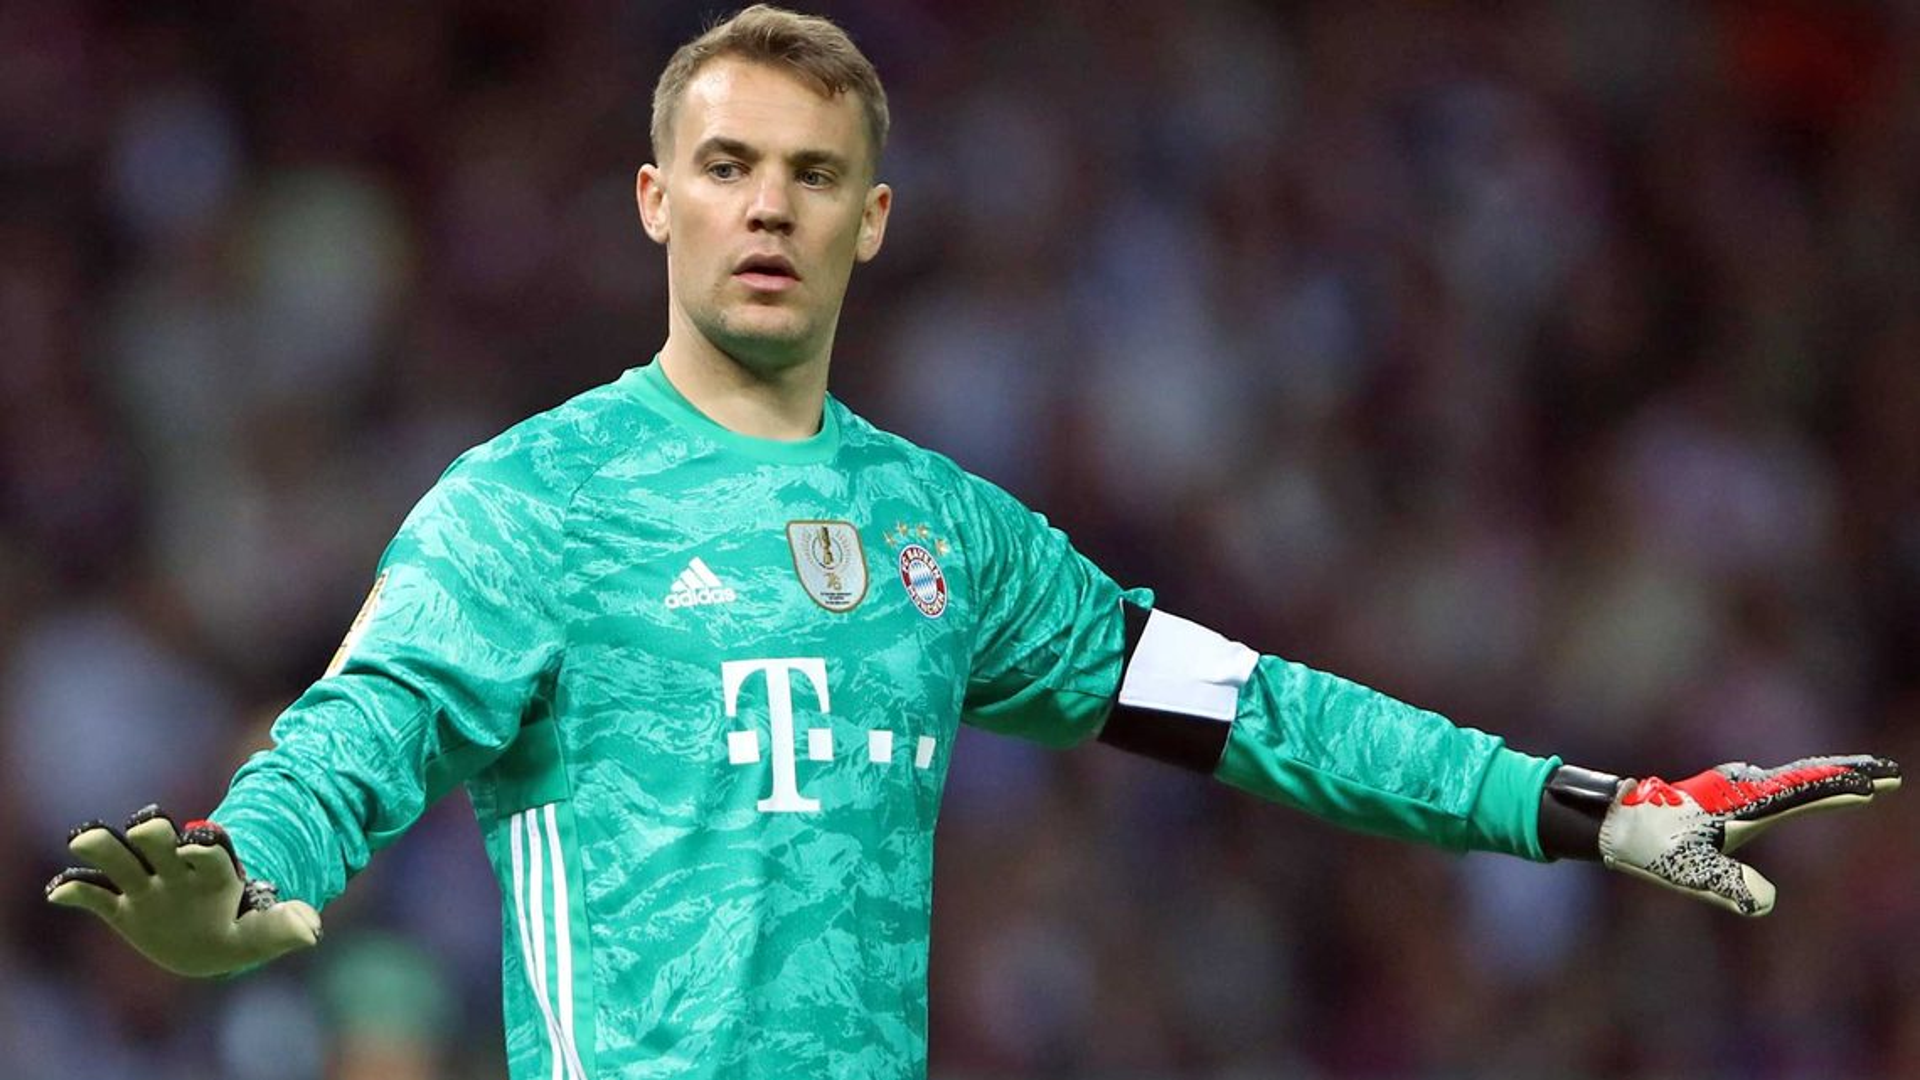 1bf98badff0 Bayern Munich and Germany goalkeeper Manuel Neuer not thinking about  retirement. one week ago